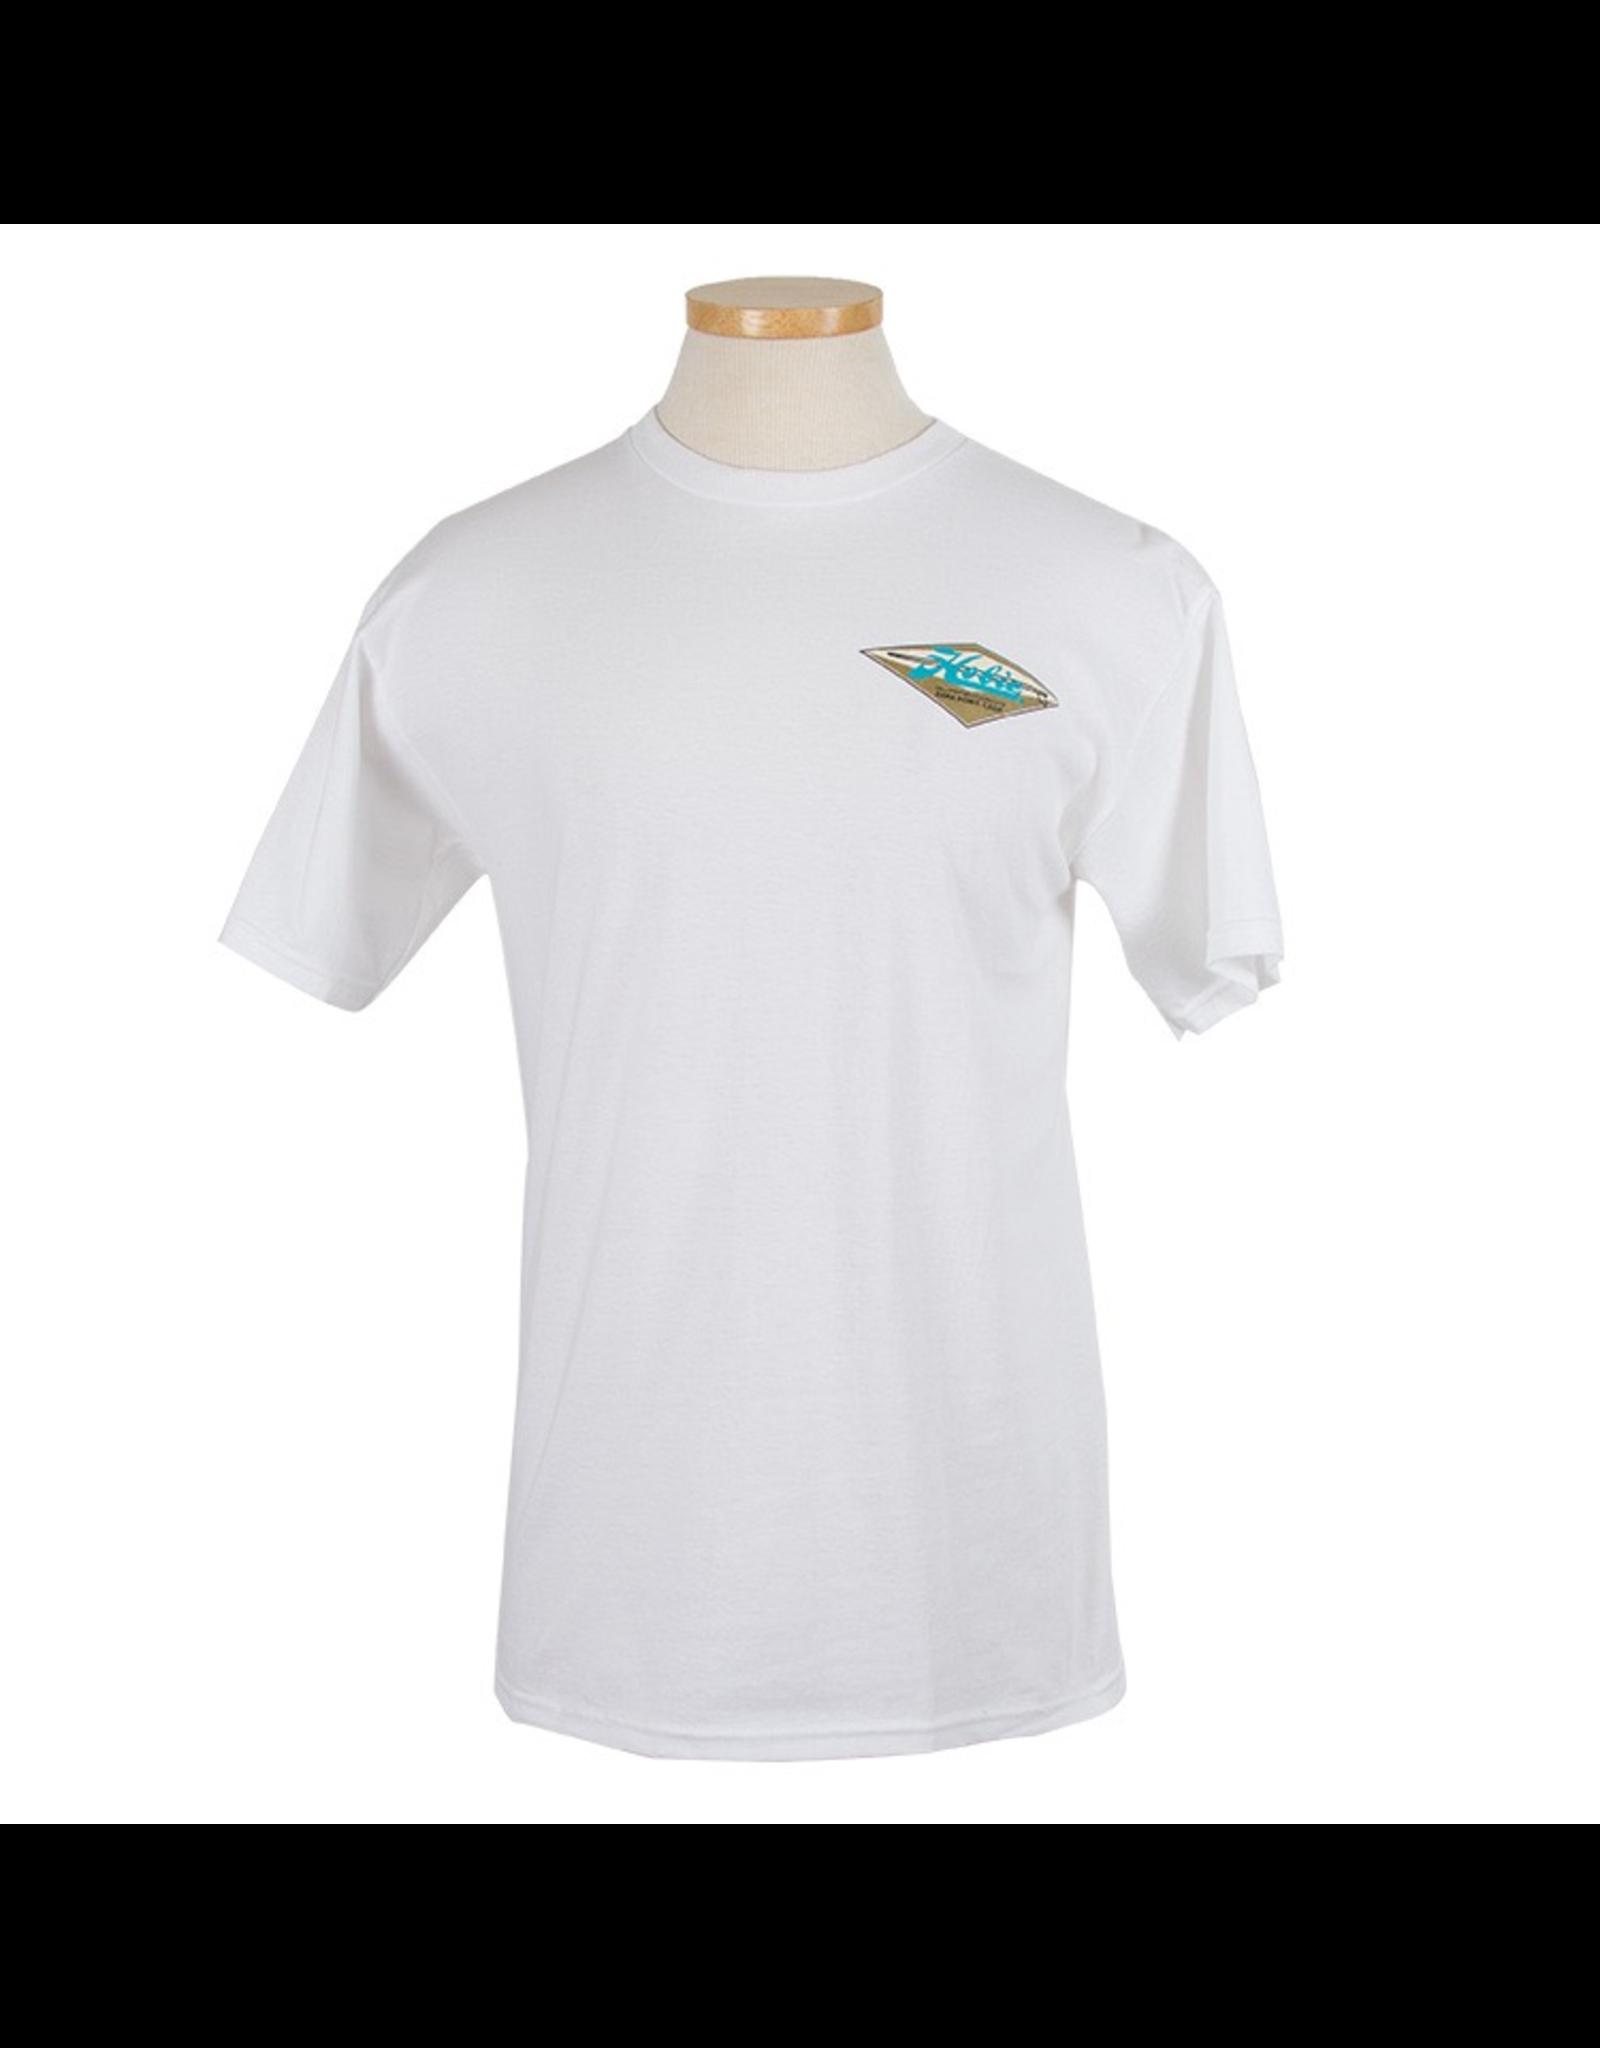 Hobie Hobie Classic White T-shirt, Short Sleeve, Diamond